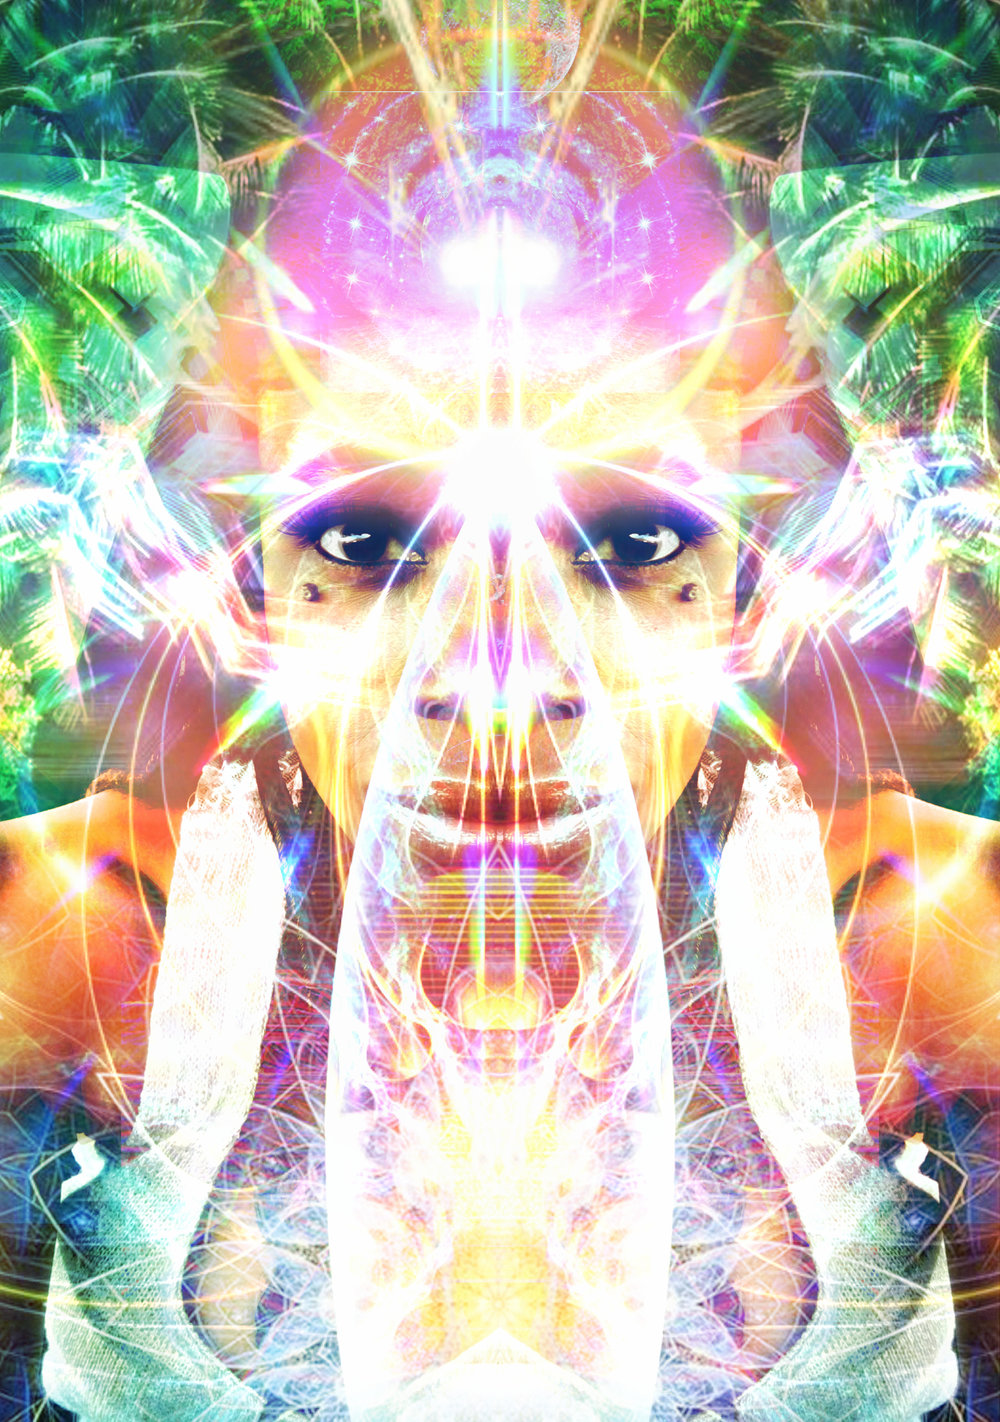 Stephanie Holographic Image.jpg